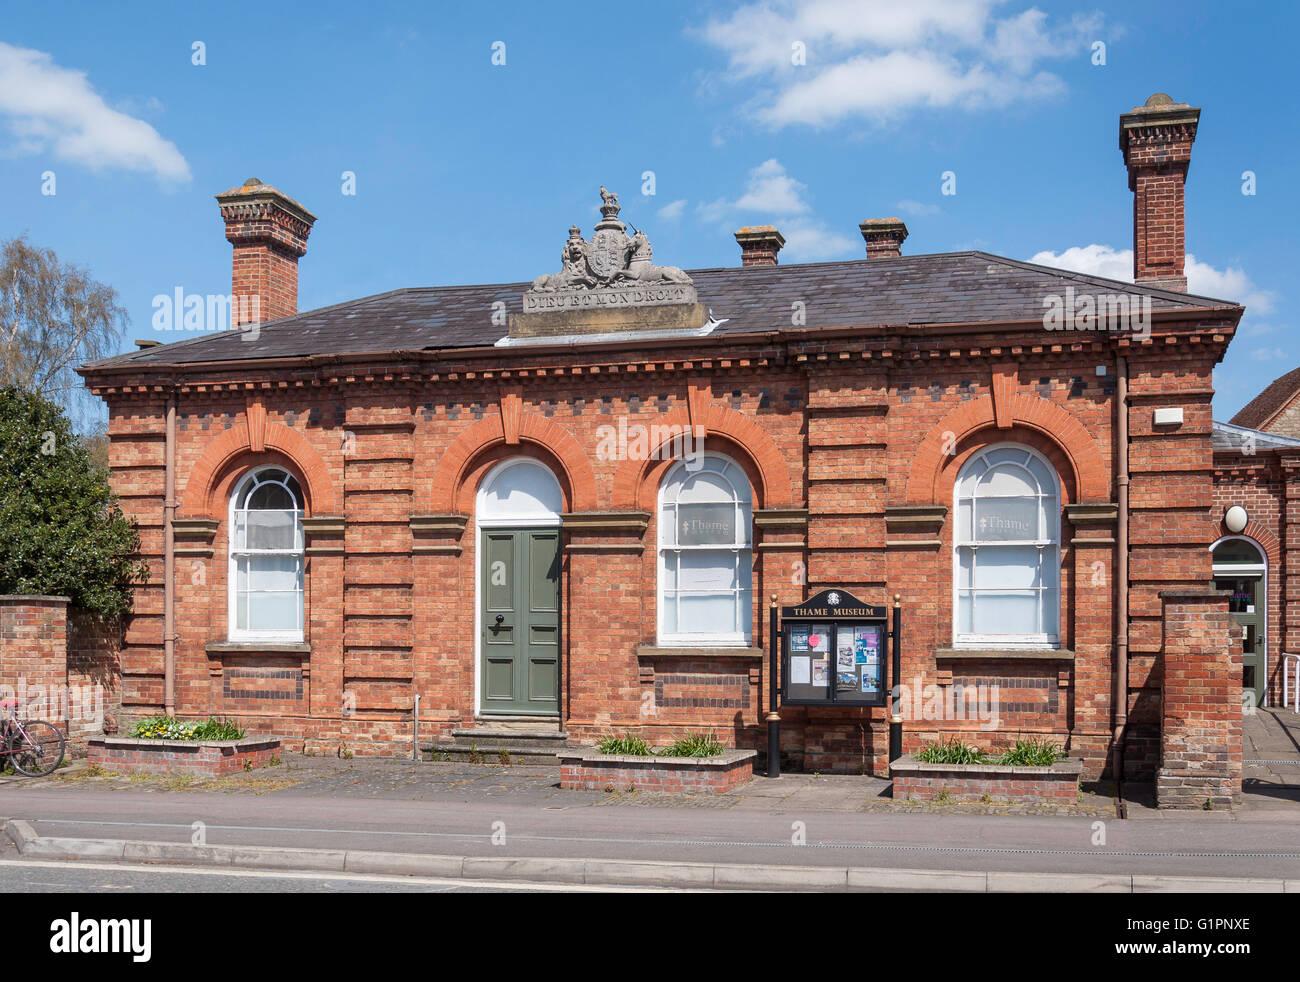 Thame Museum, High Street, Thame, Oxfordshire, England, United Kingdom - Stock Image